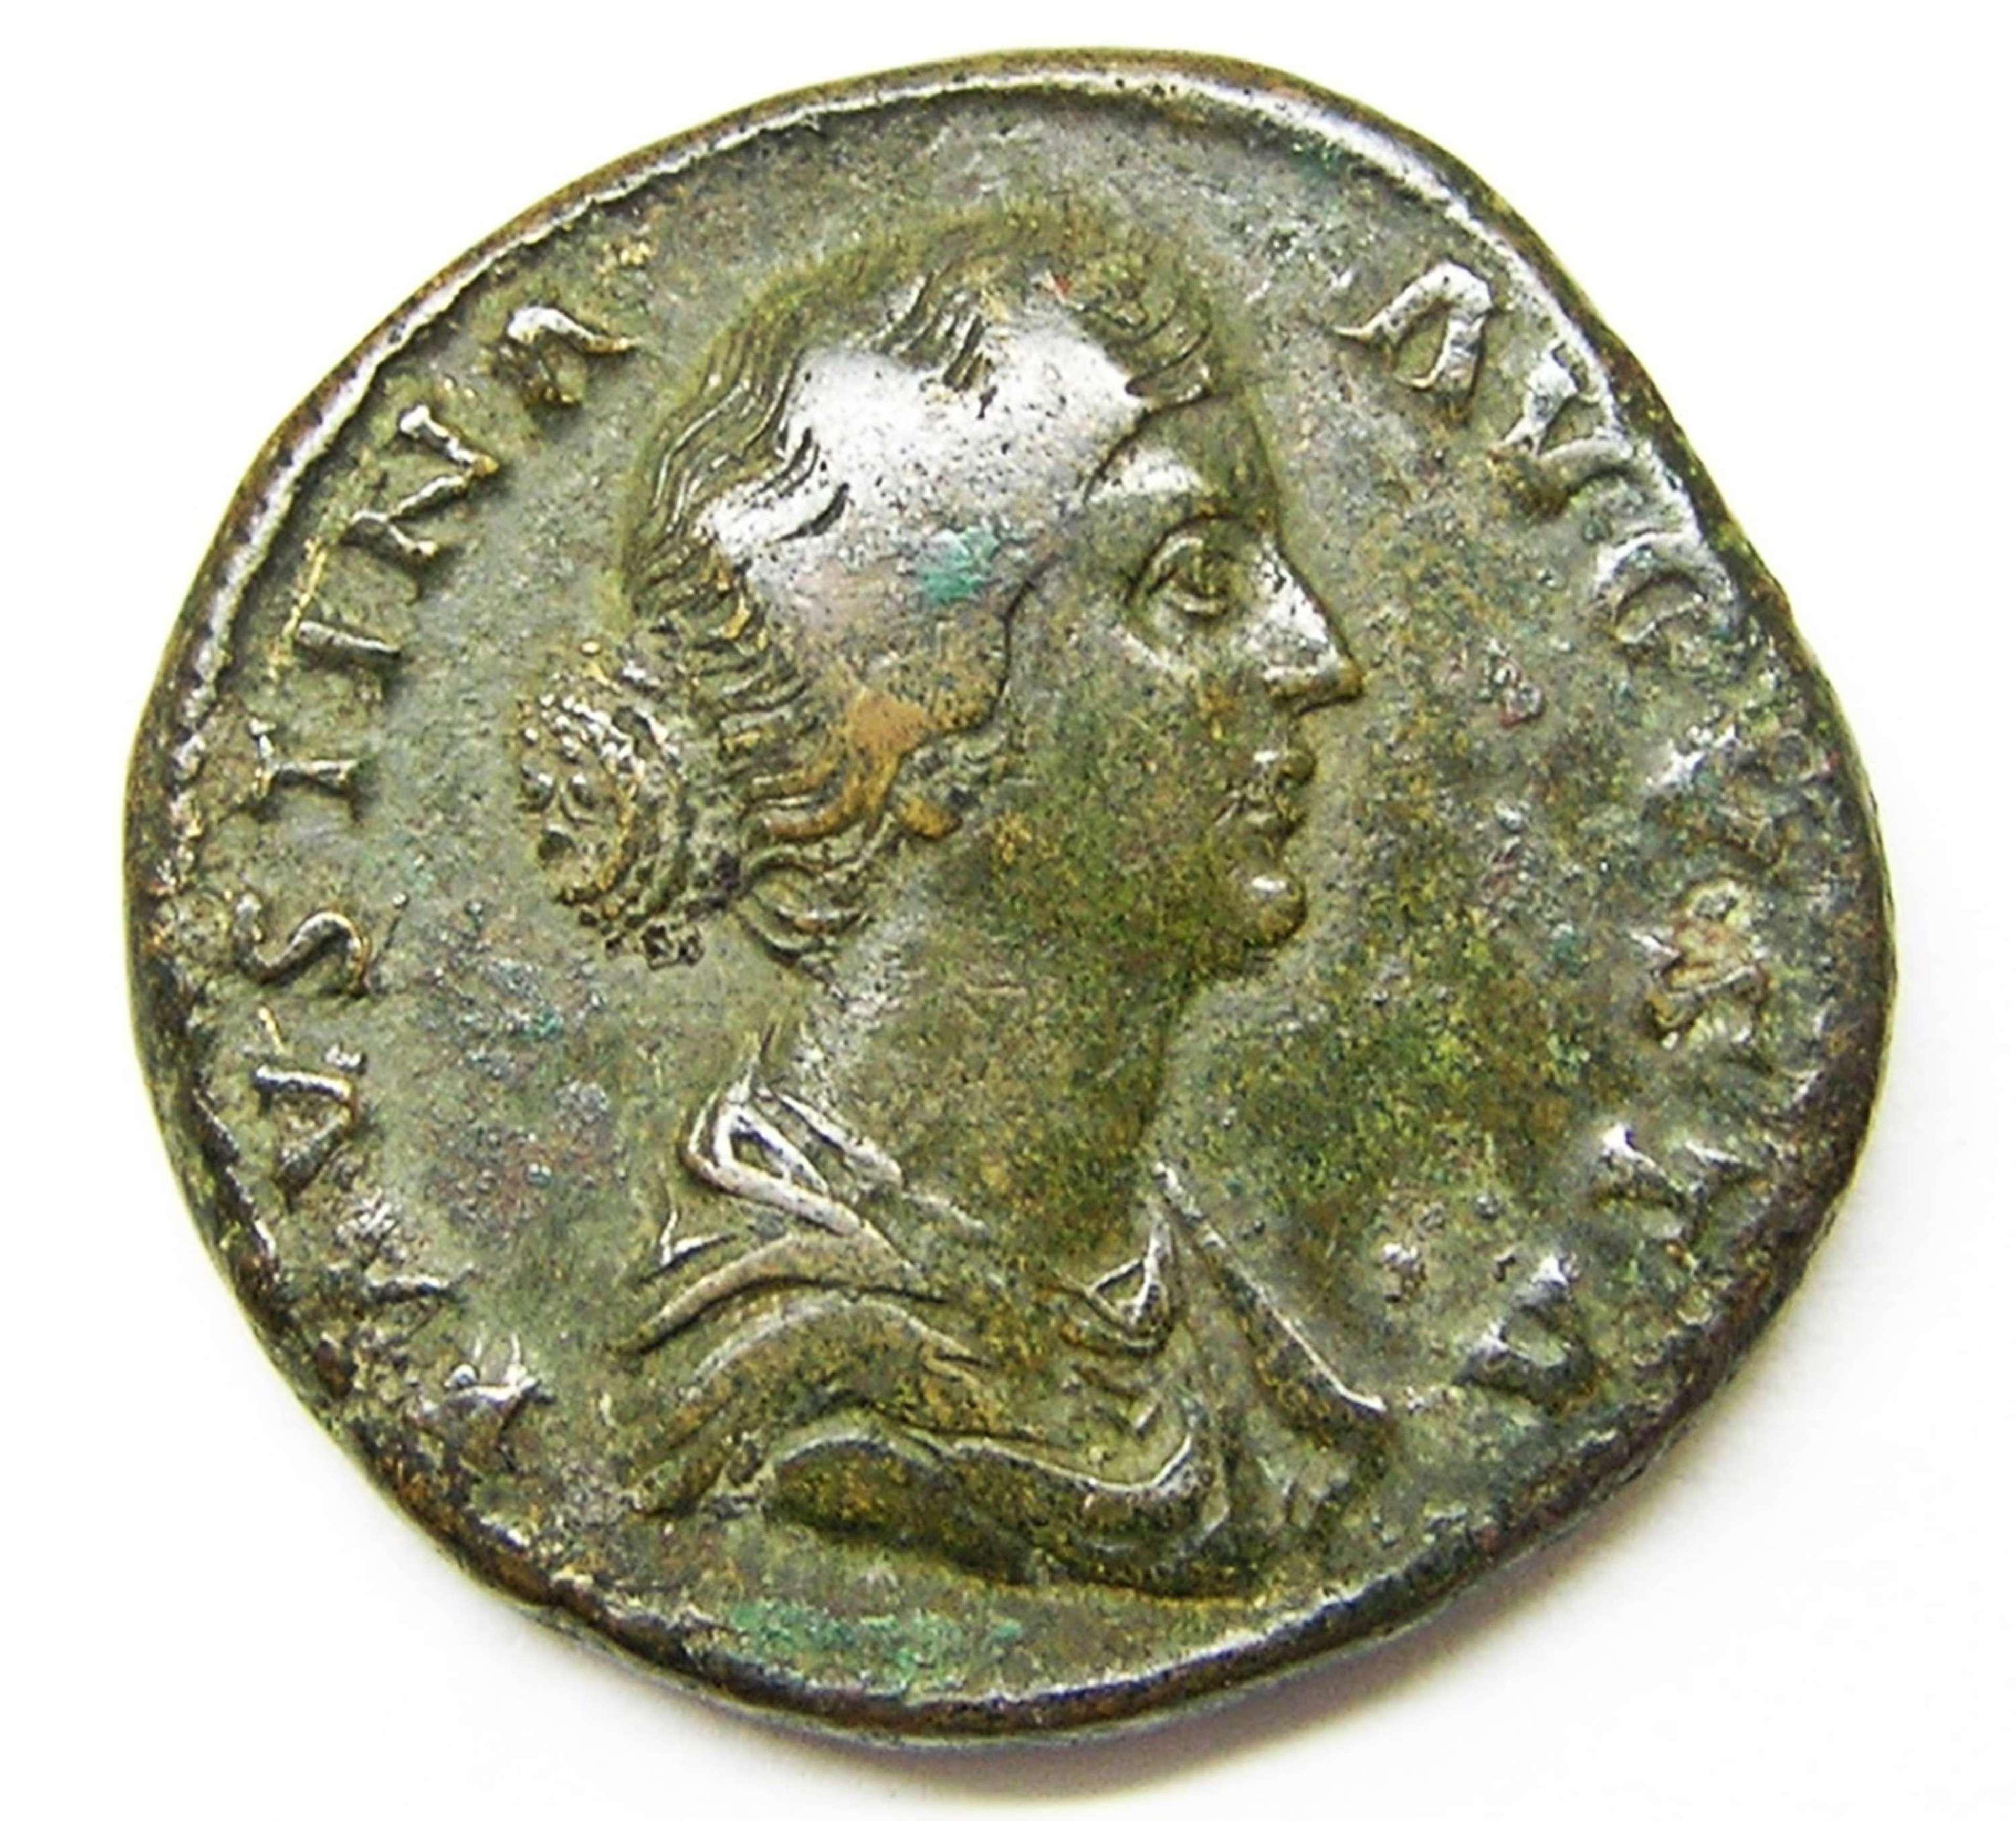 Ancient Roman Sestertius empress Faustina II / Diana bringer of light